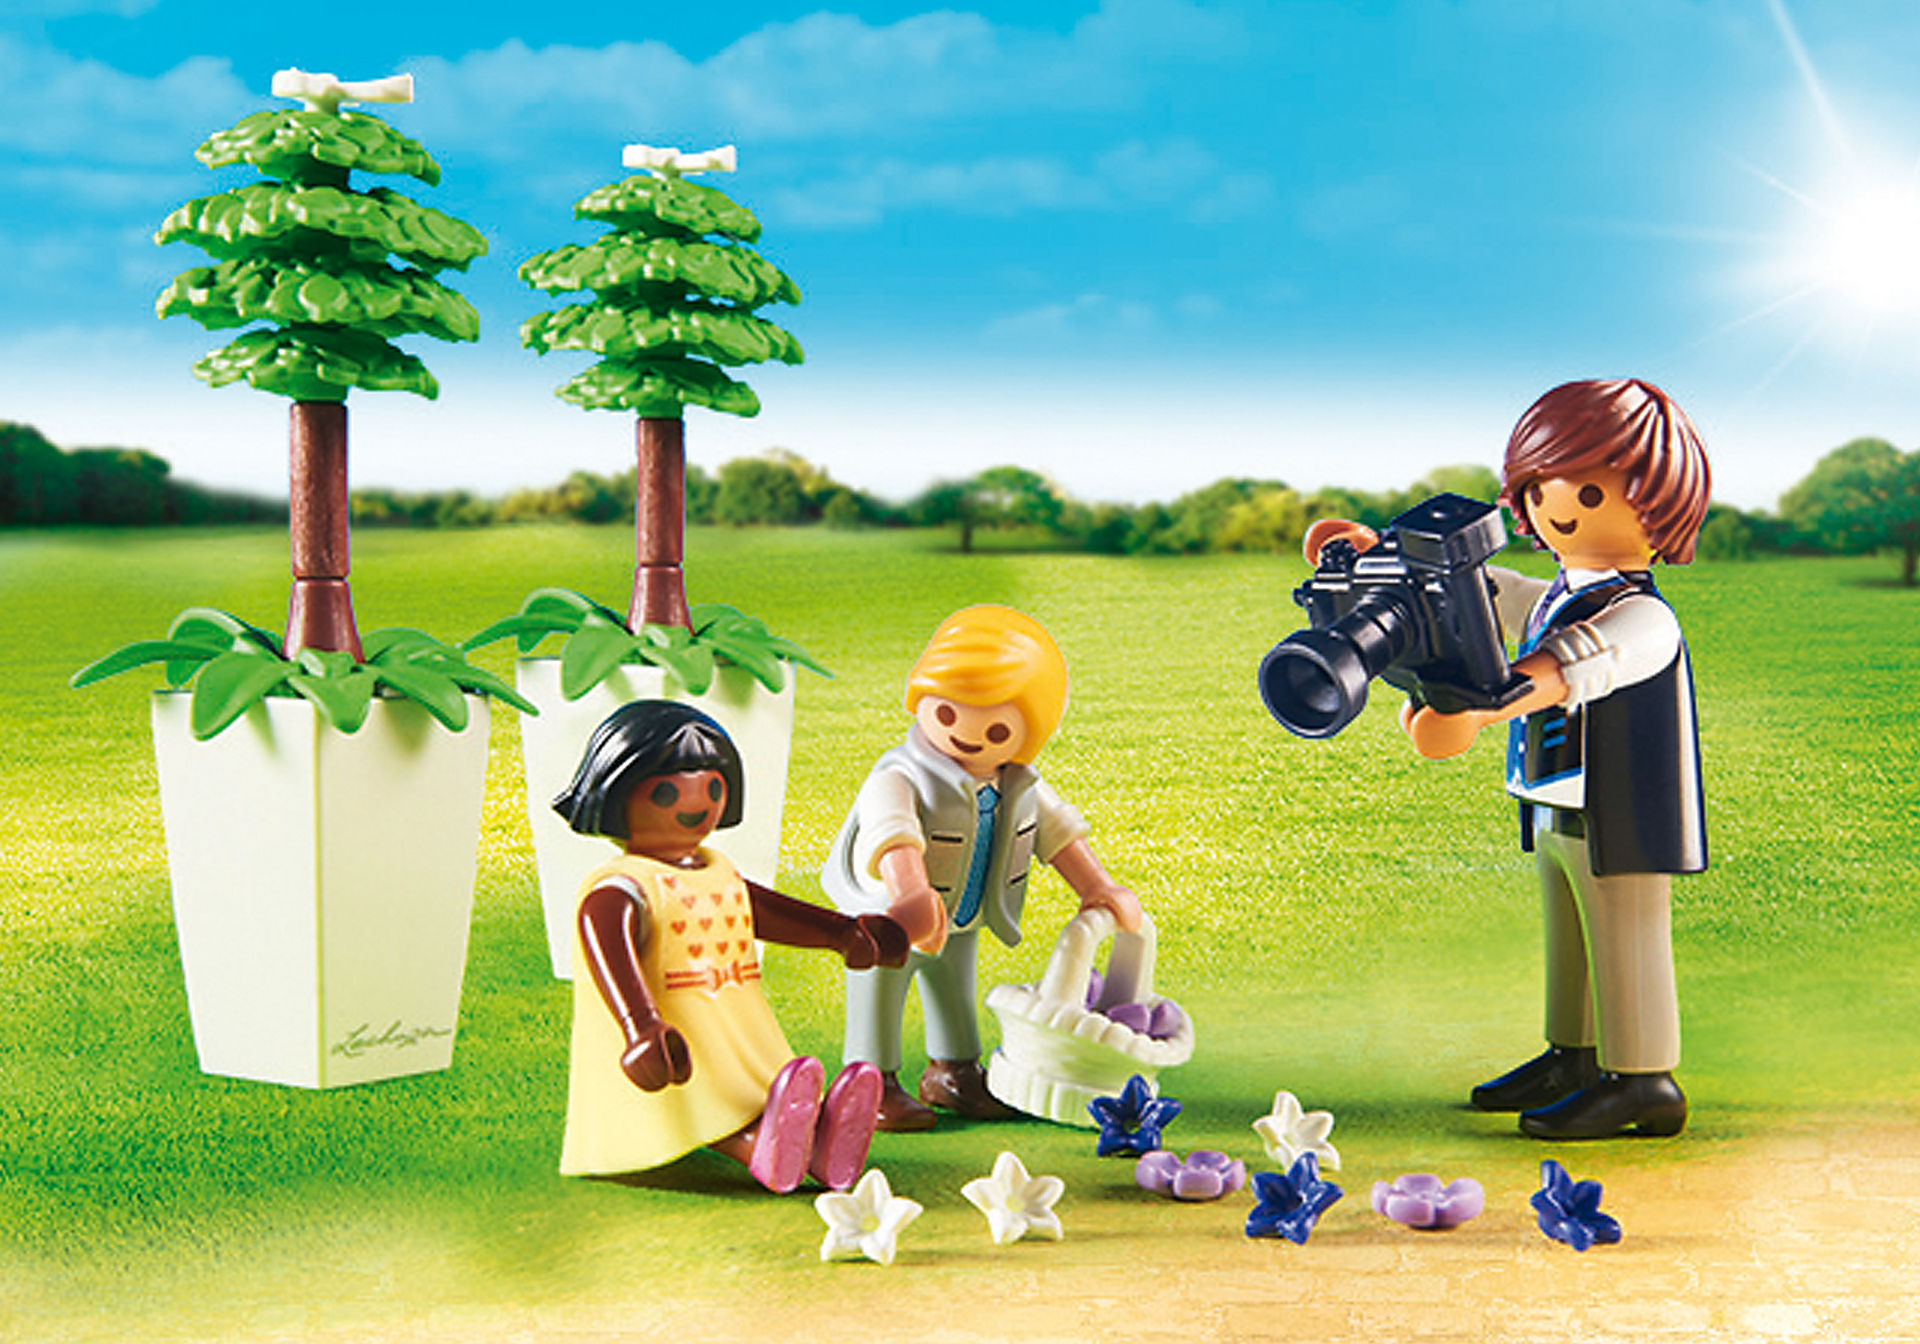 http://media.playmobil.com/i/playmobil/9230_product_extra1/Enfants d'honneur avec photographe